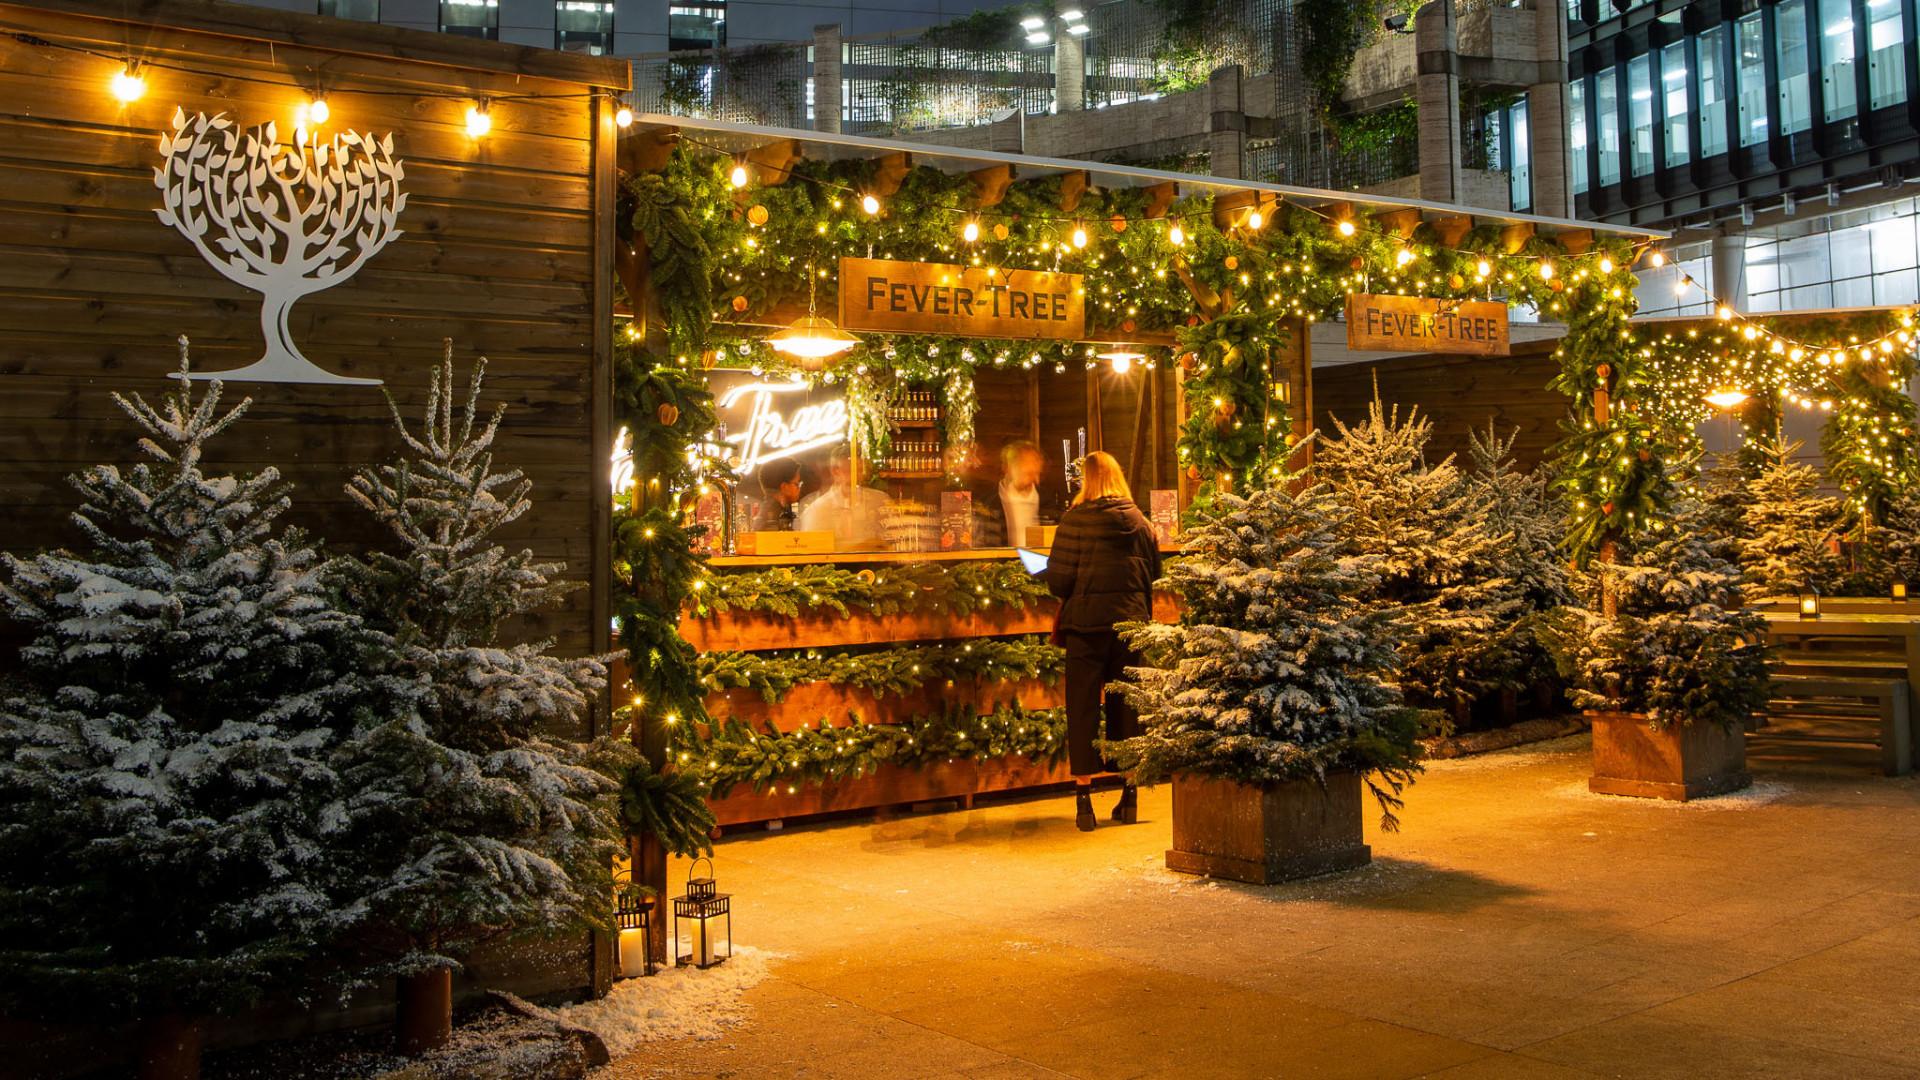 Fever Tree winter lodge Broadgate Circle